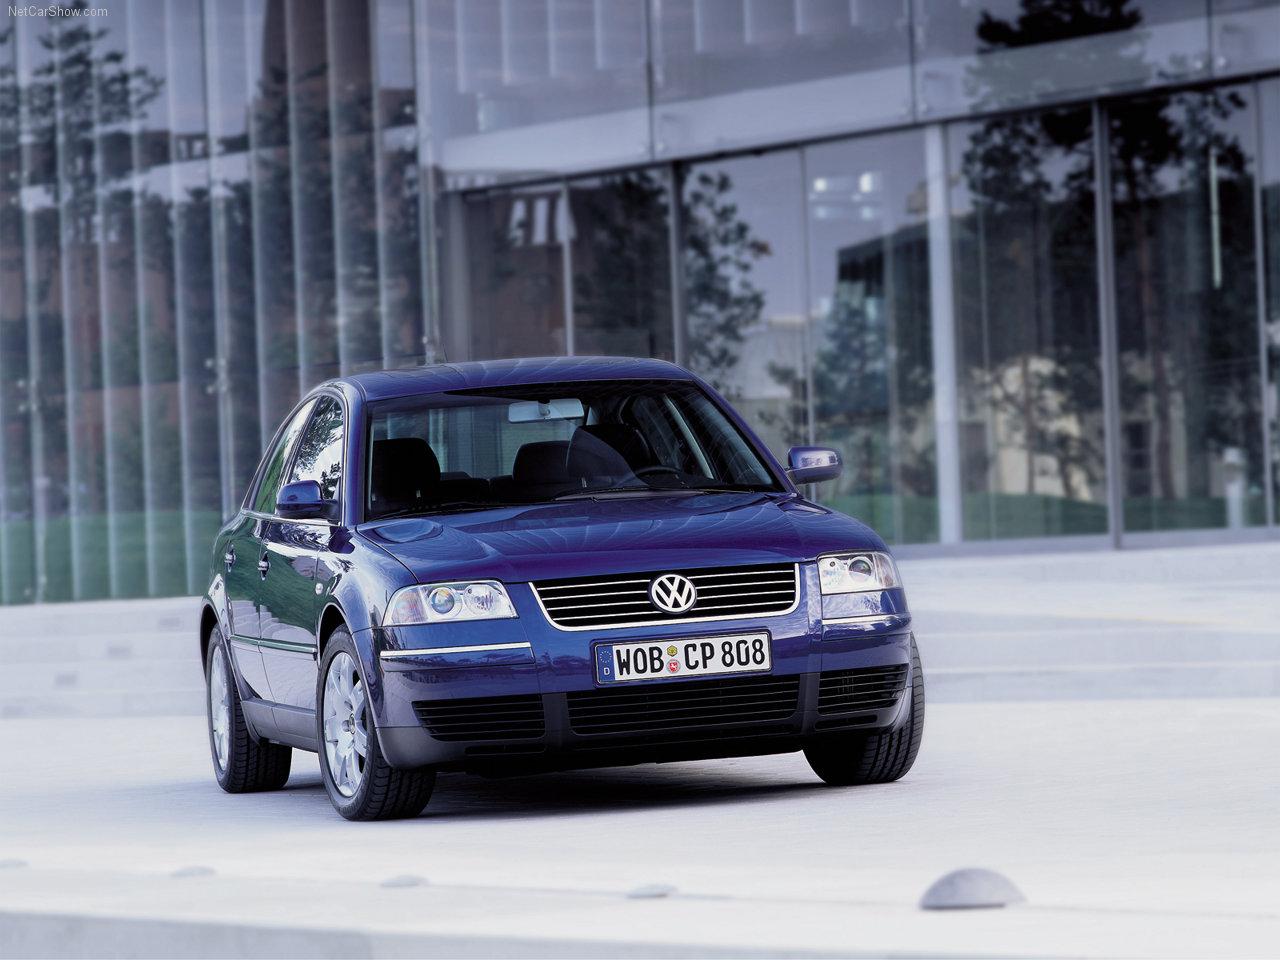 http://3.bp.blogspot.com/-LYwxBaWWMec/TXxPP0Kp9qI/AAAAAAAANVA/ydJGun9x1i0/s1600/Volkswagen-Passat_2000_1280x960_wallpaper_01.jpg